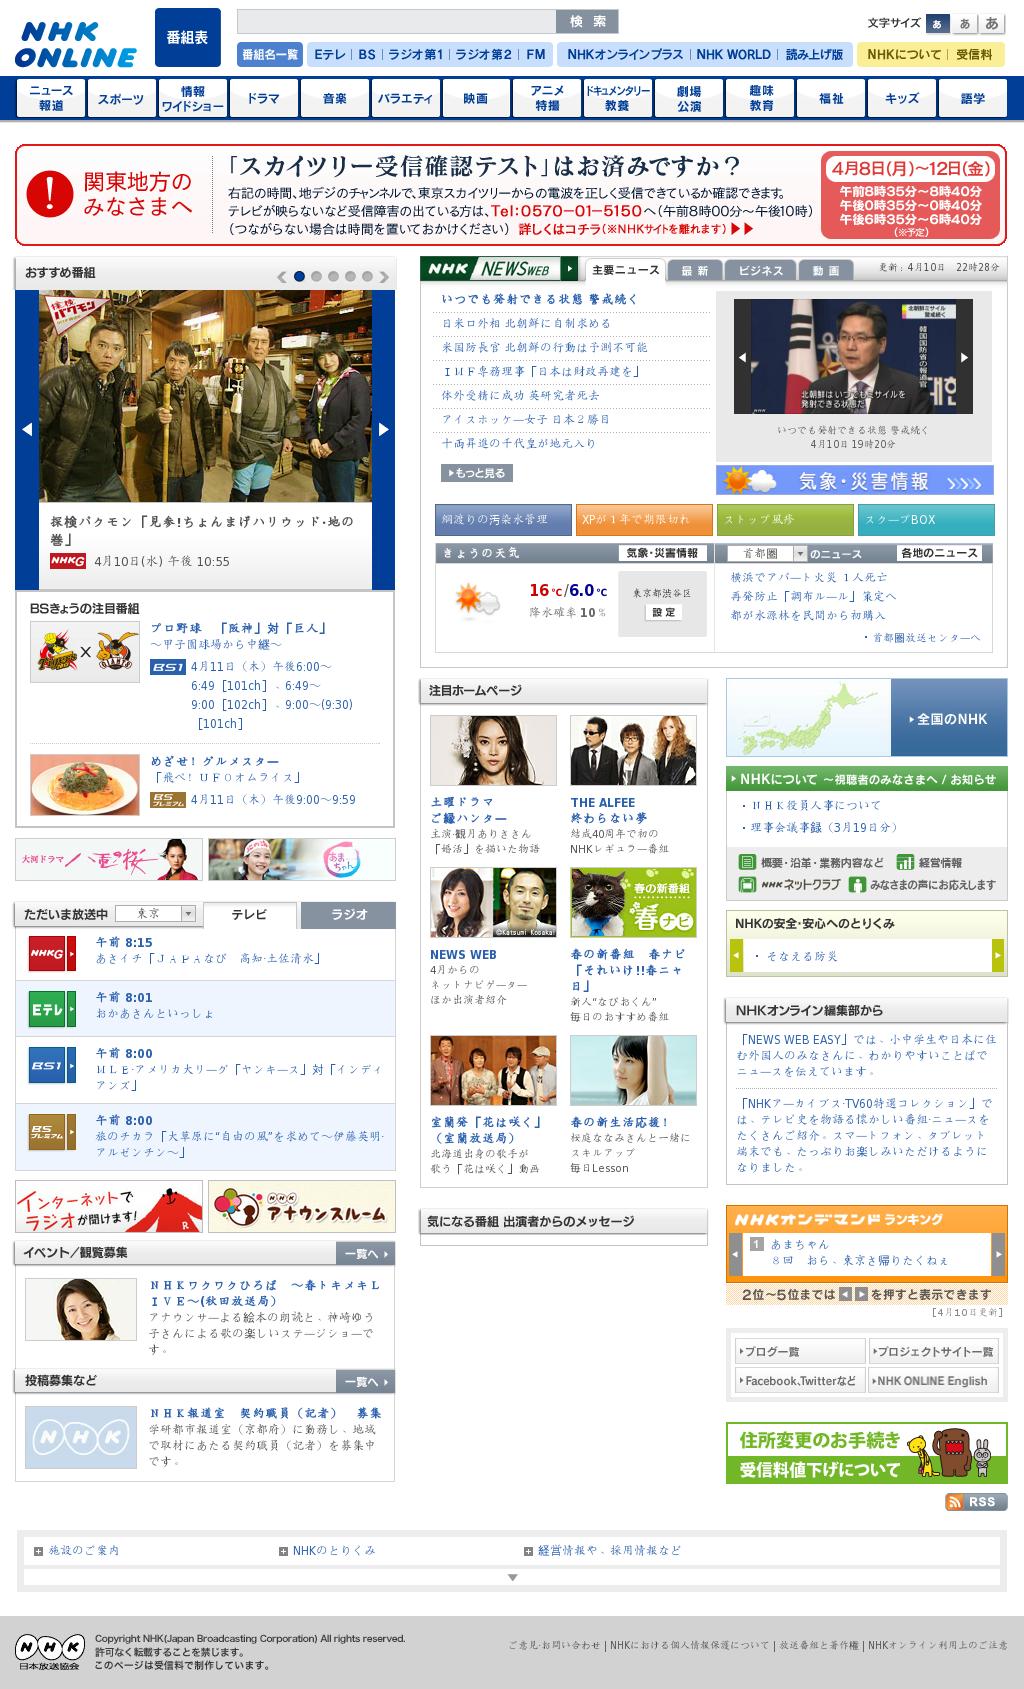 NHK Online at Wednesday April 10, 2013, 11:18 p.m. UTC